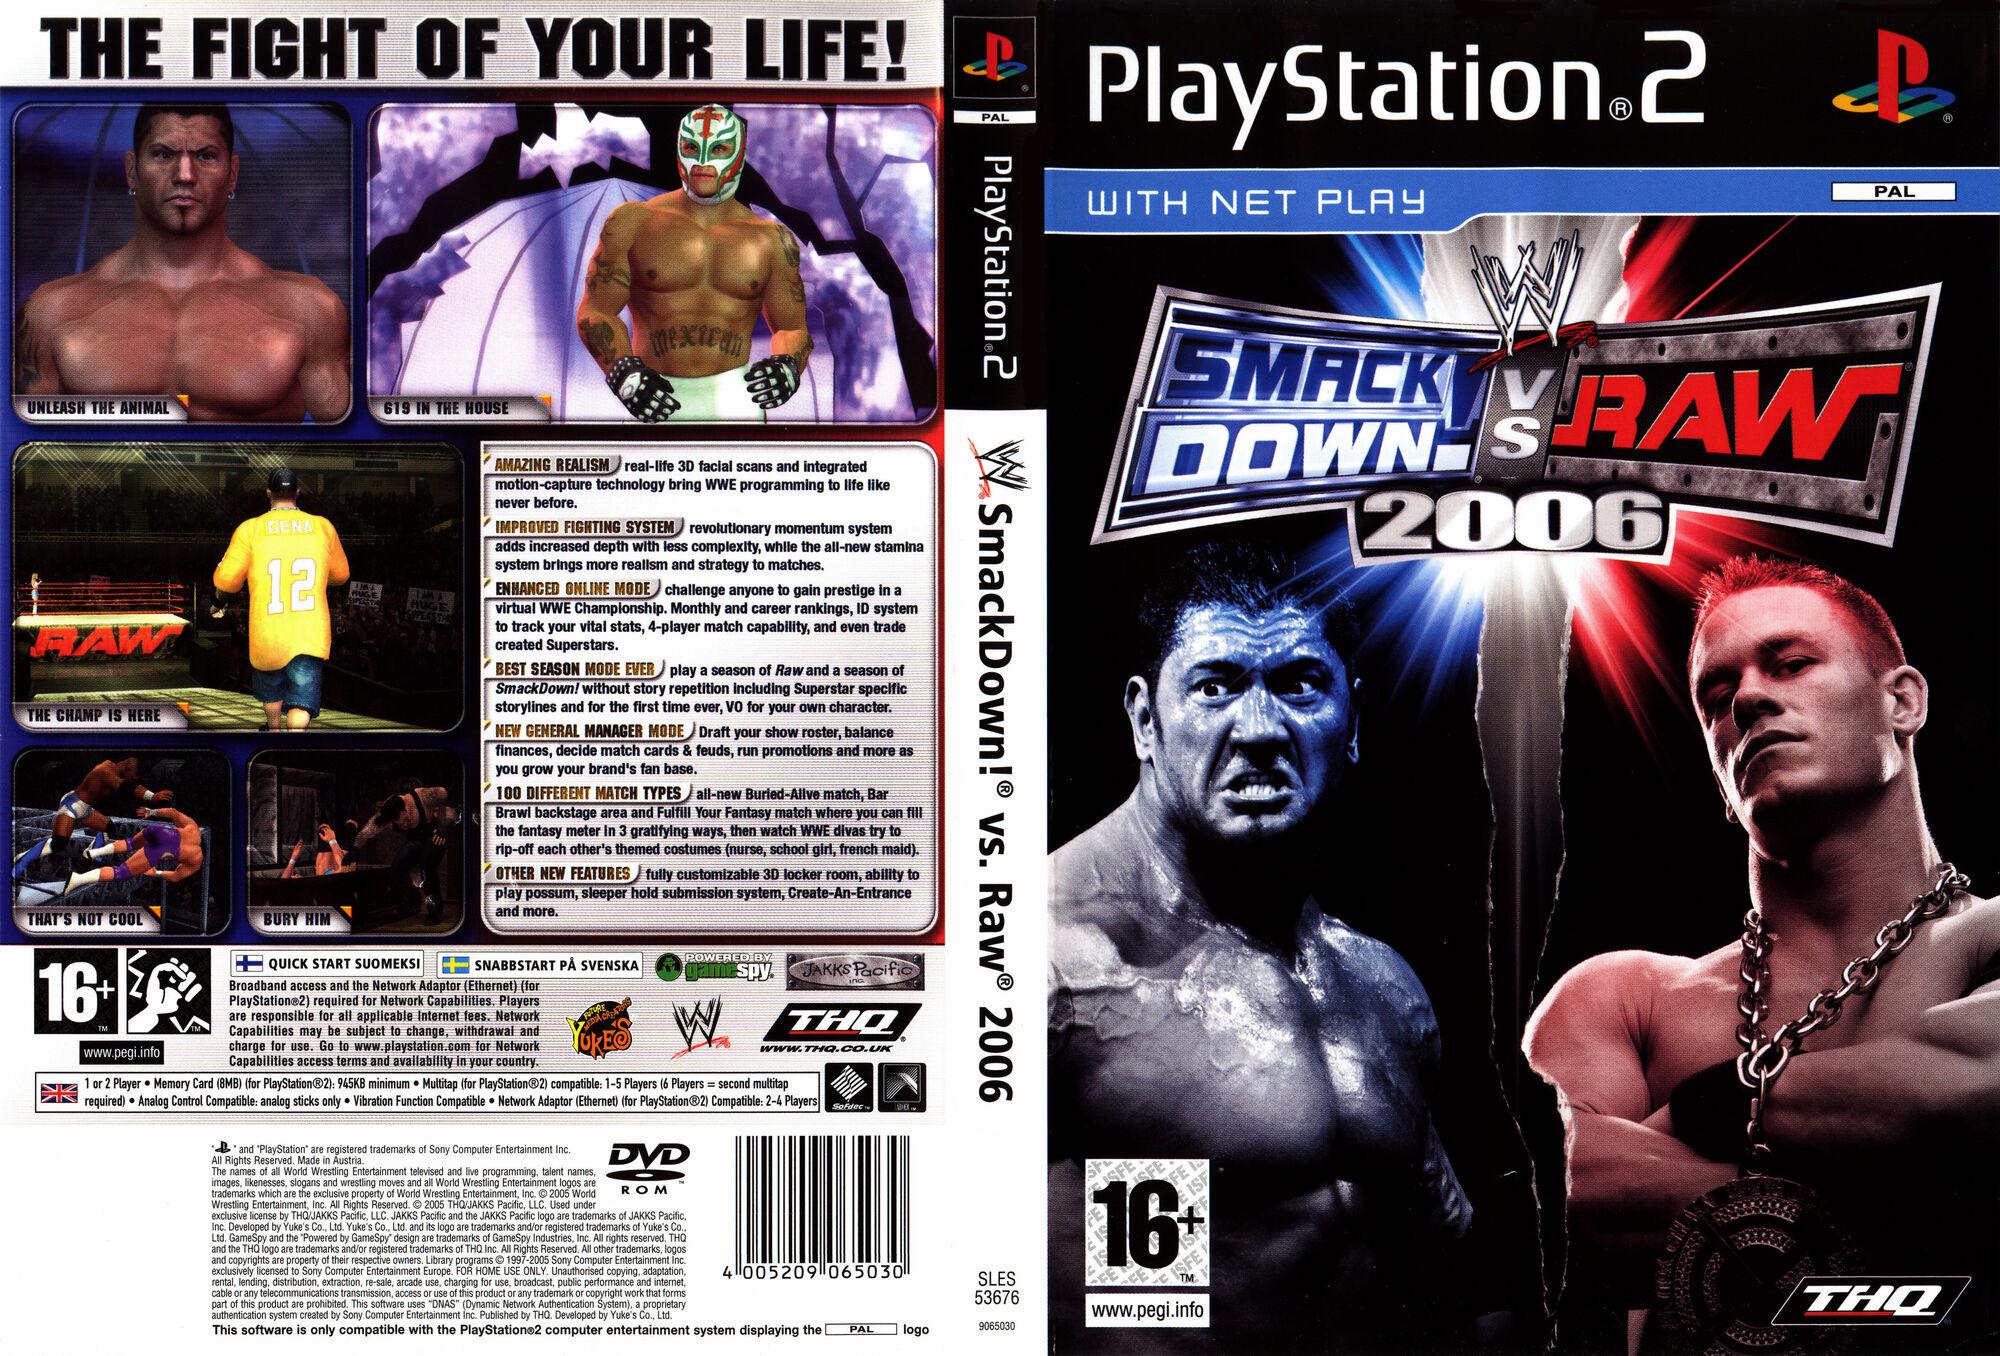 2006 control raw smackdown vs